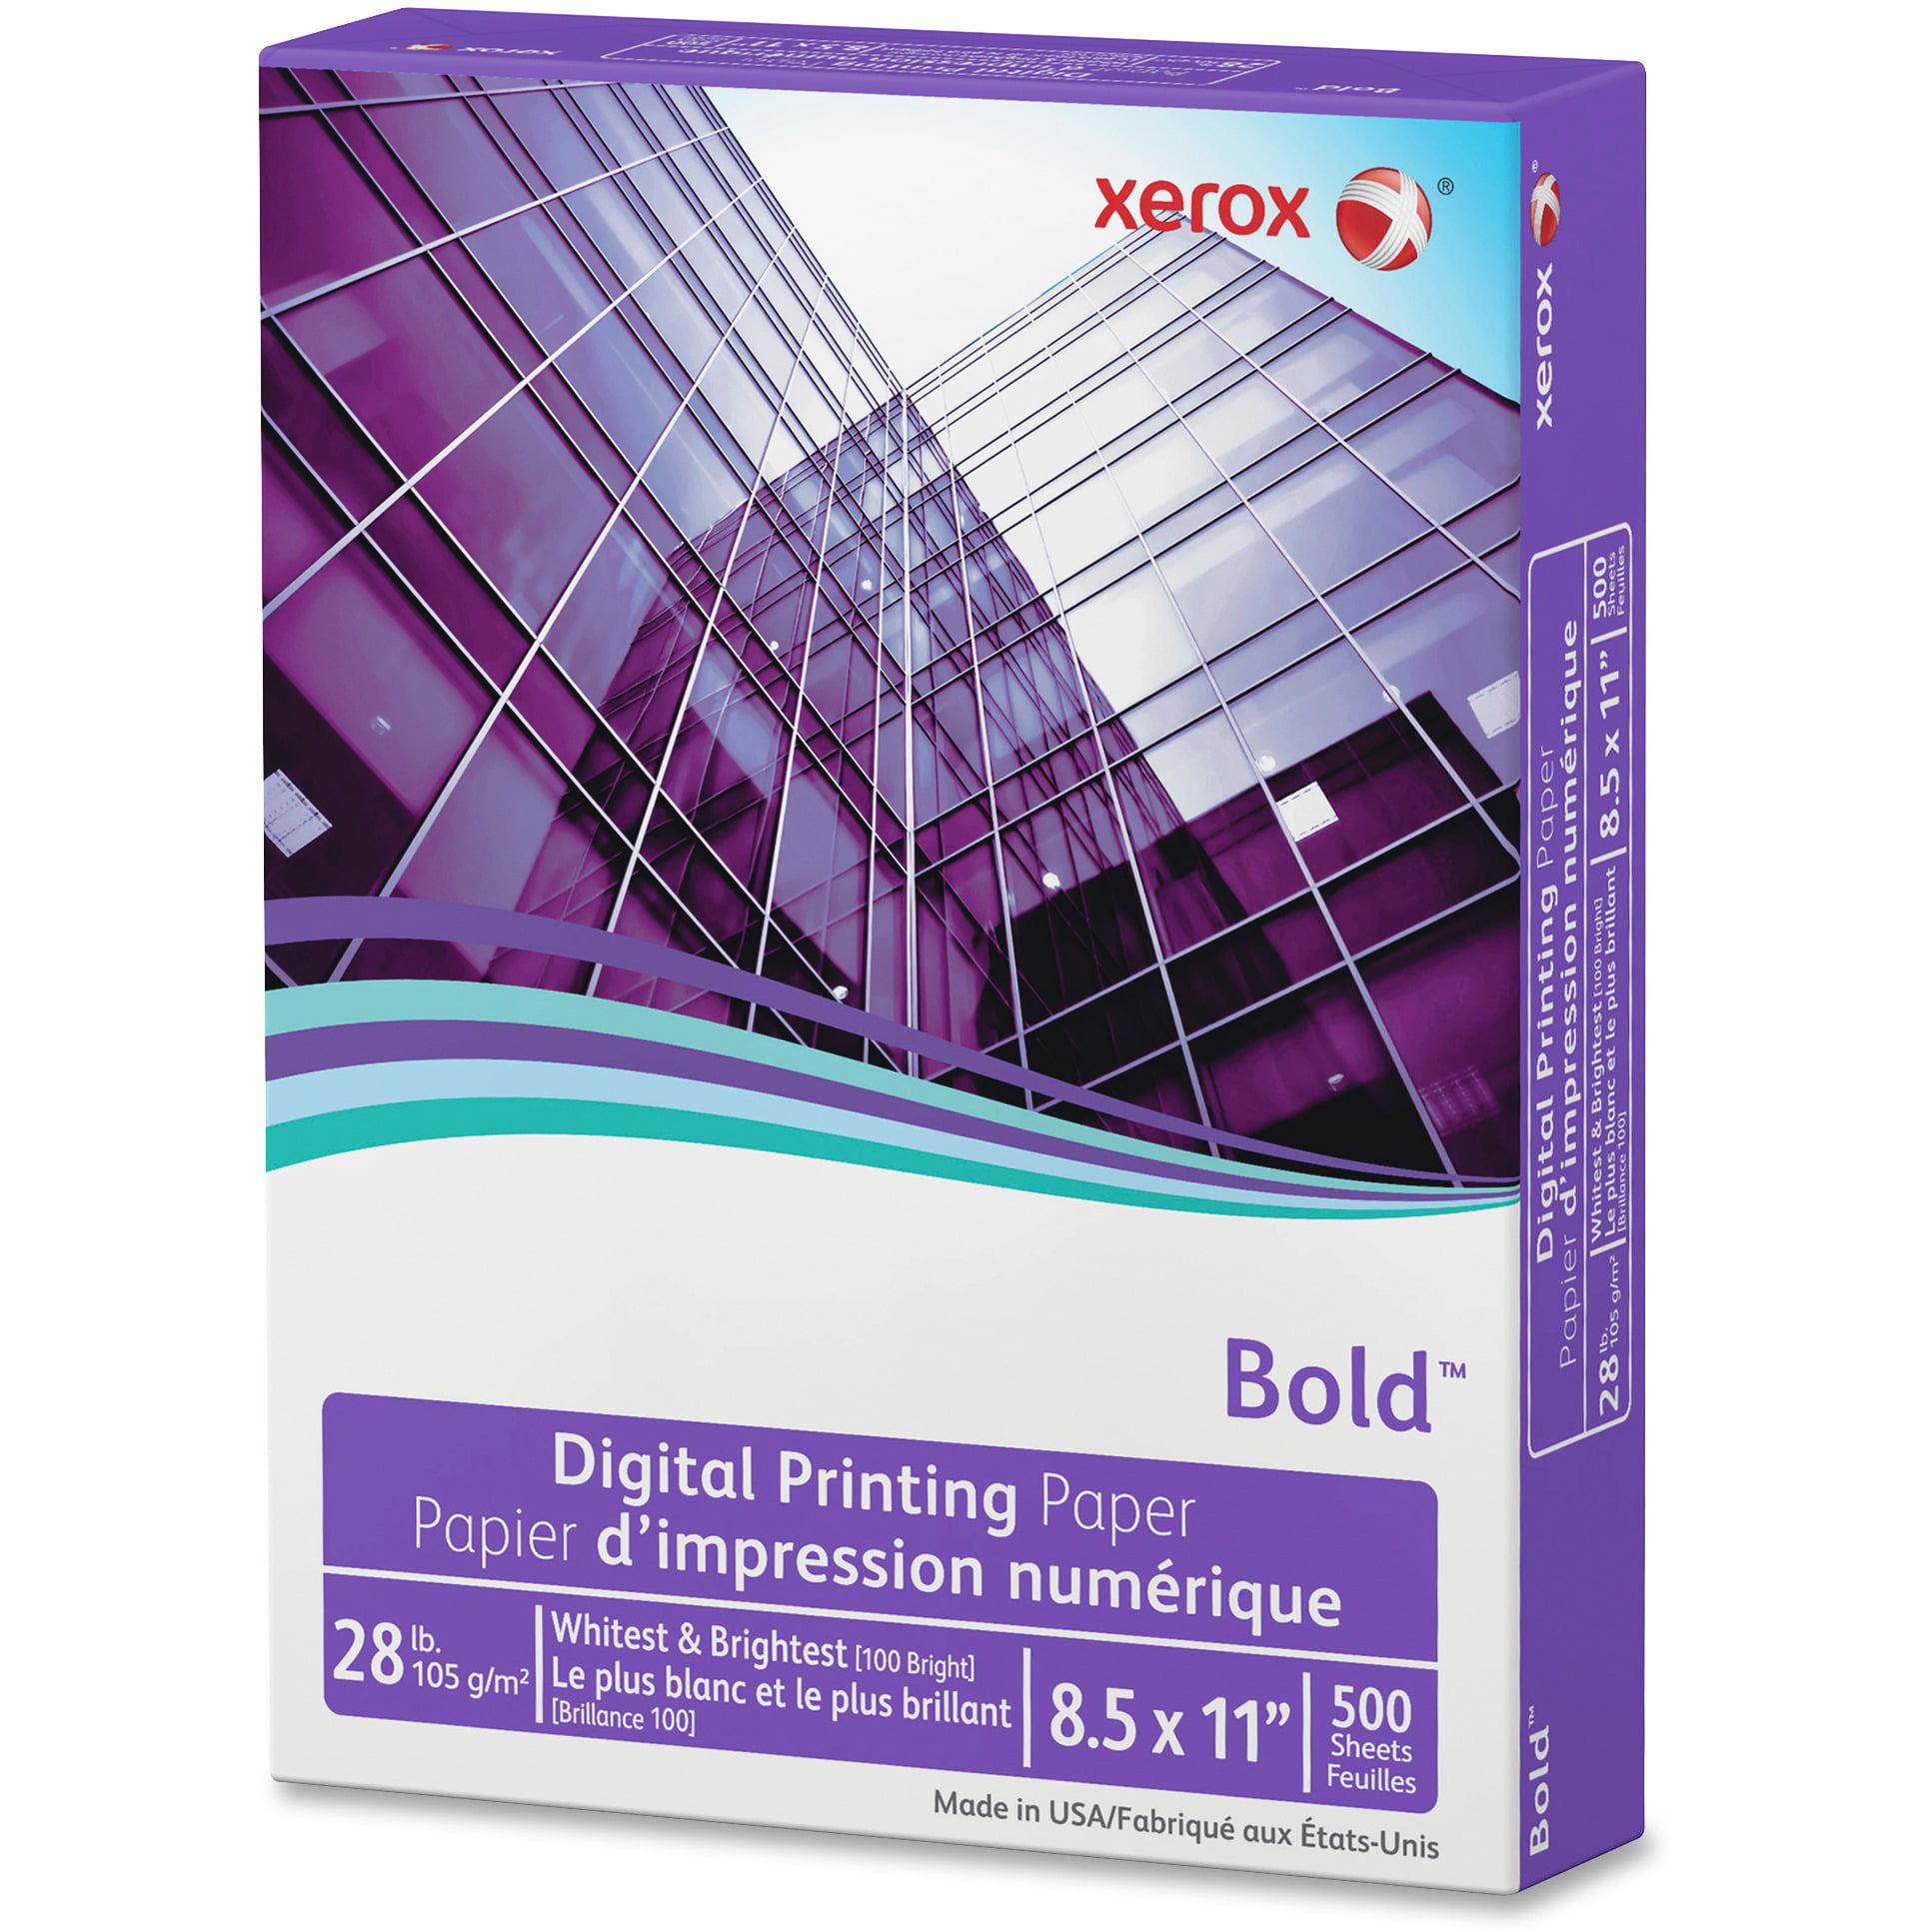 Xerox, XER3R11760, Bold Digital Printing Paper, 500 / Ream, White